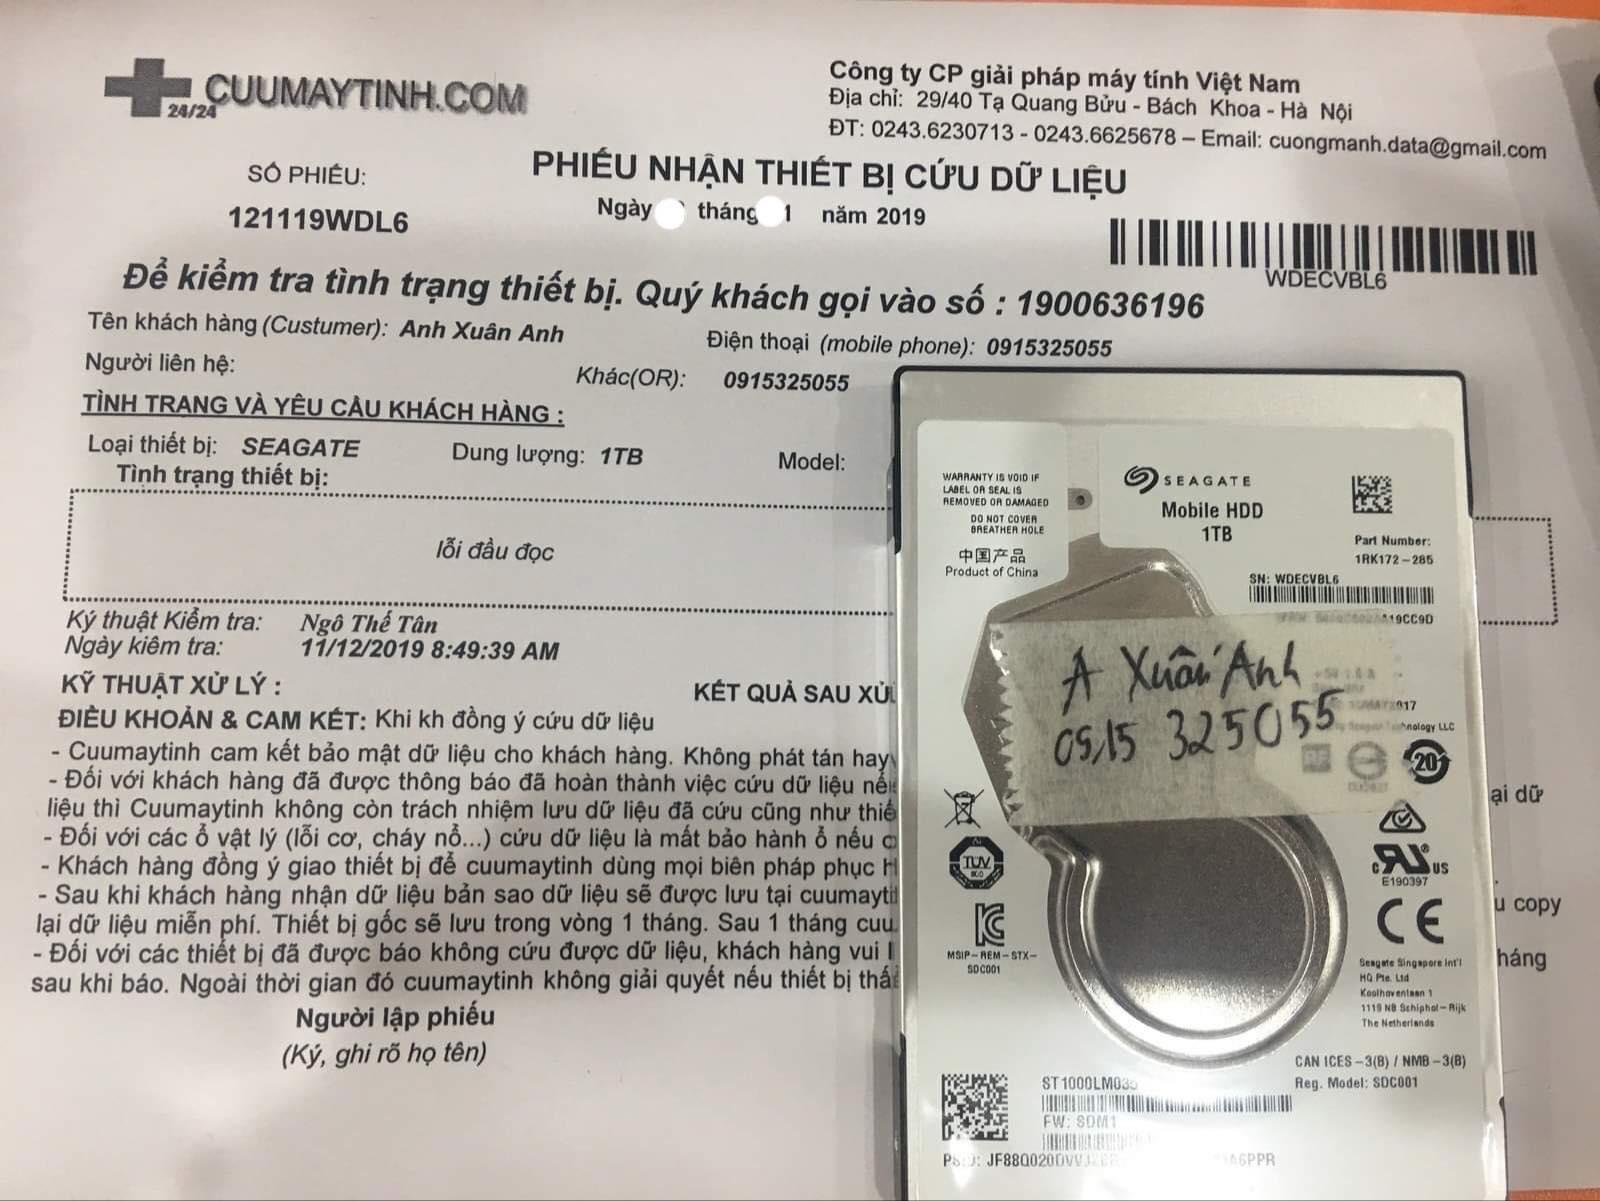 Cứu dữ liệu ổ cứng Seagate 1TB lỗi đầu đọc 13/12/2019 - cuumaytinh